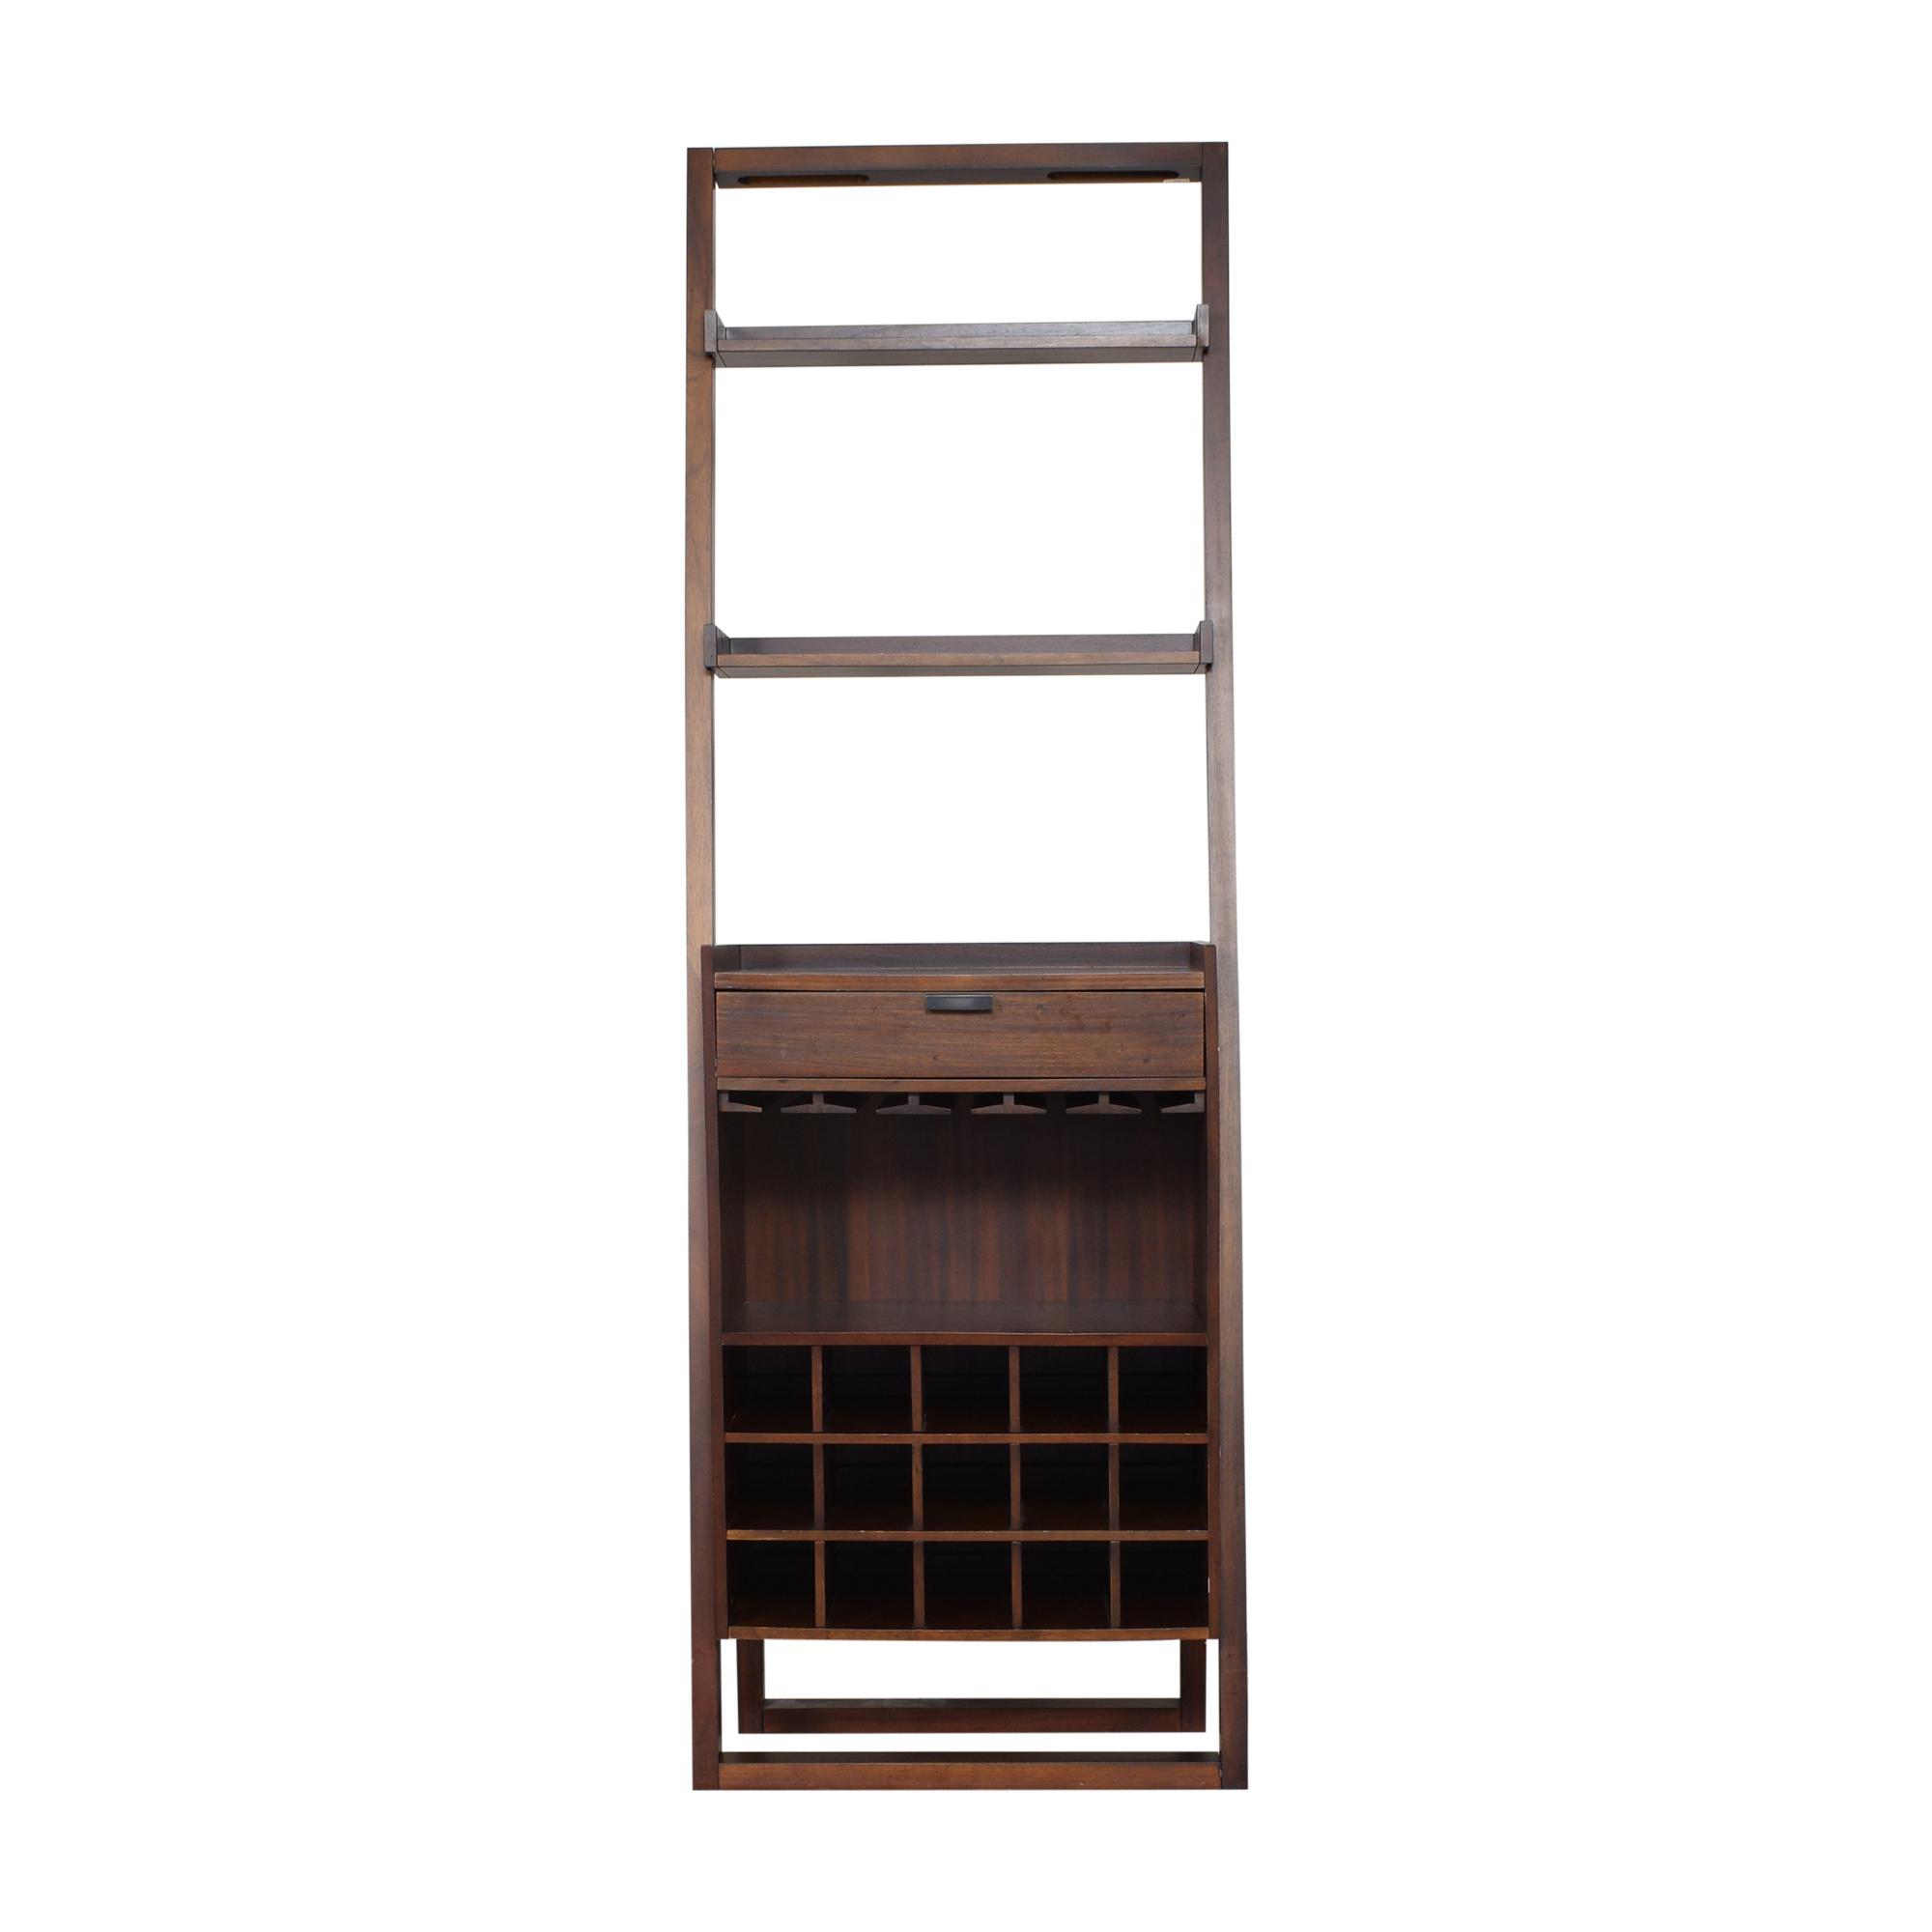 shop Crate & Barrel Sloane Leaning Wine Bar Crate & Barrel Bookcases & Shelving